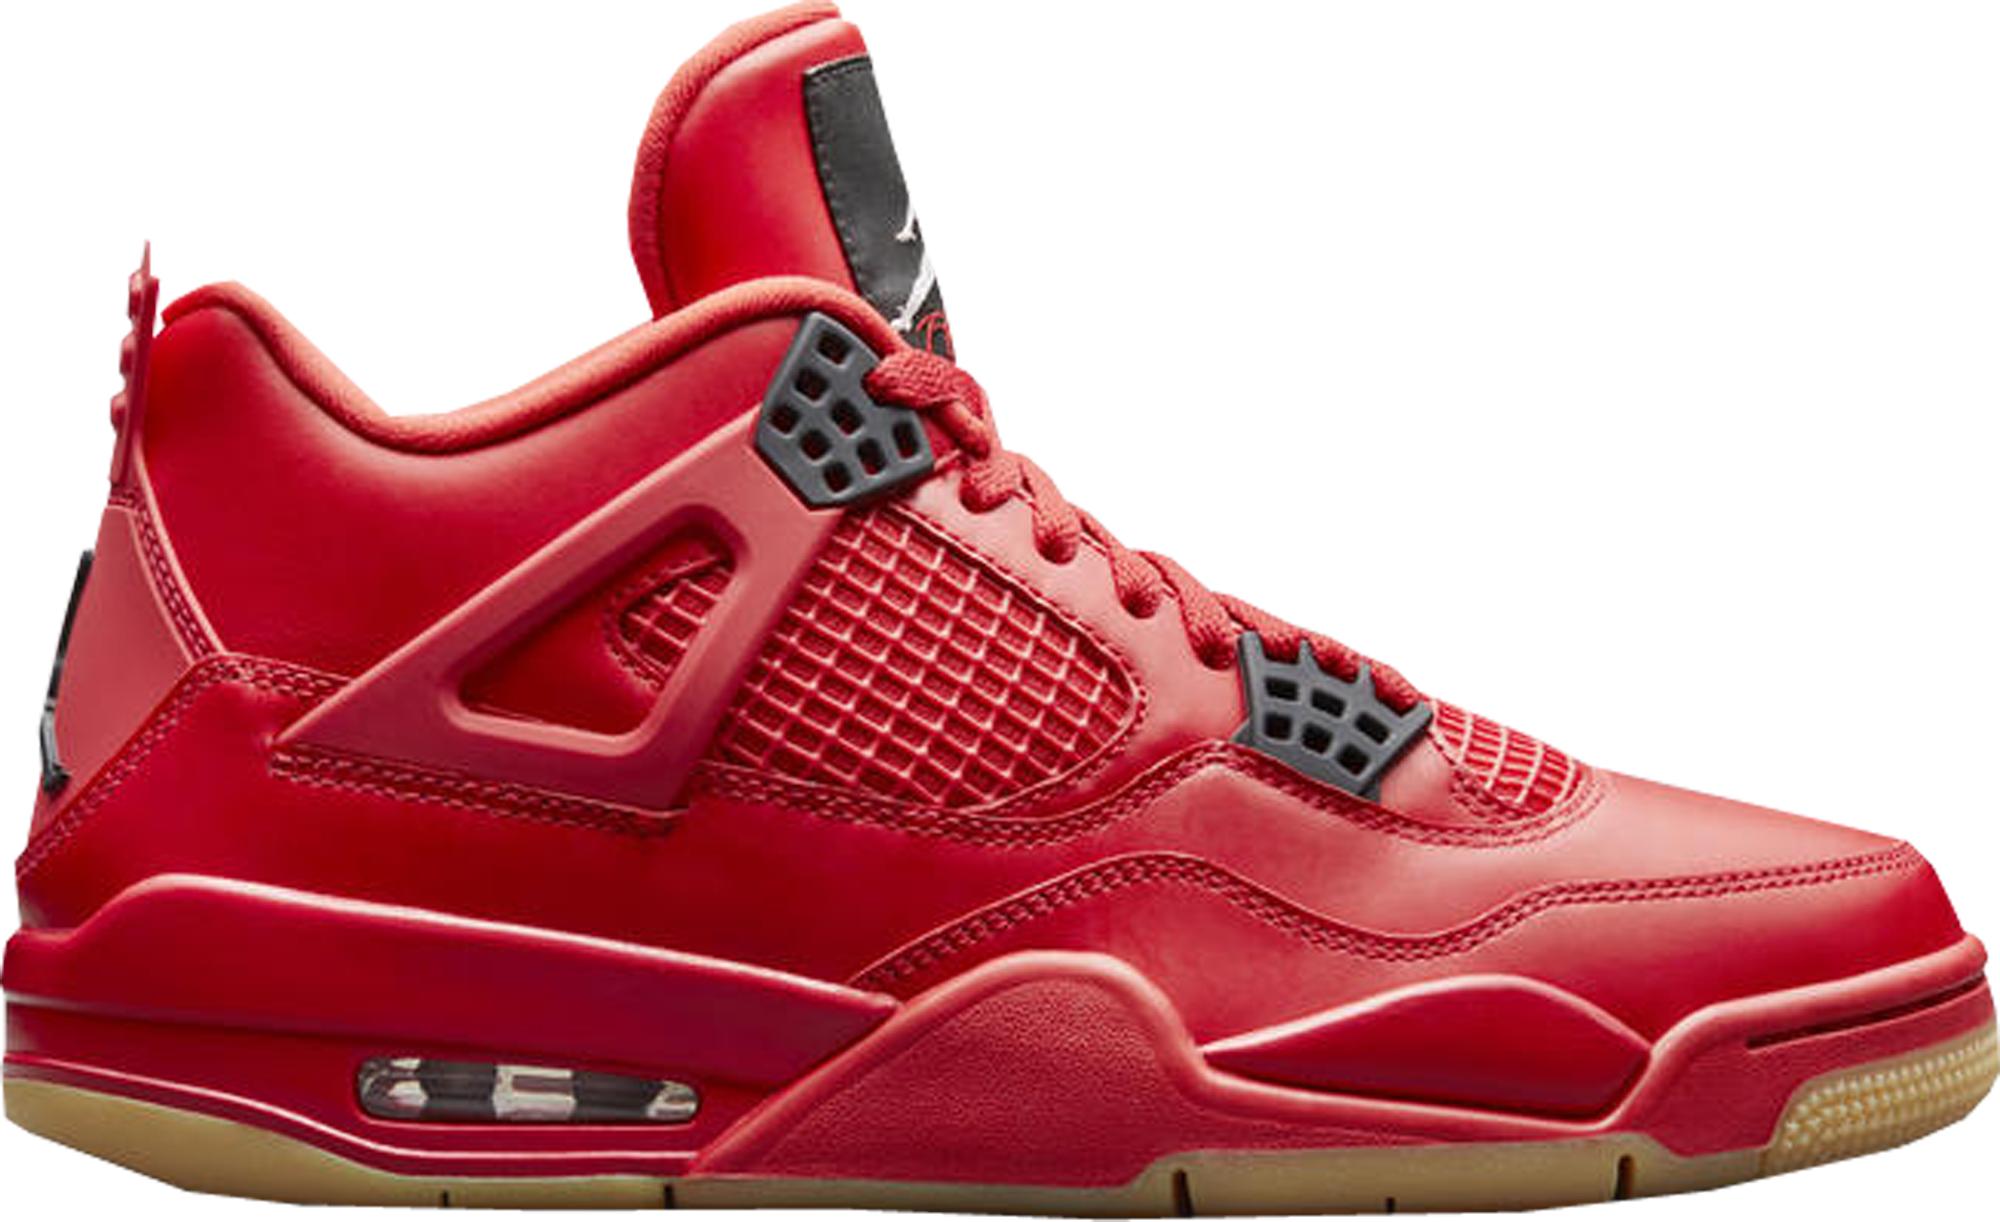 Jordan 4 Retro Fire Red Singles Day 2018 (W)